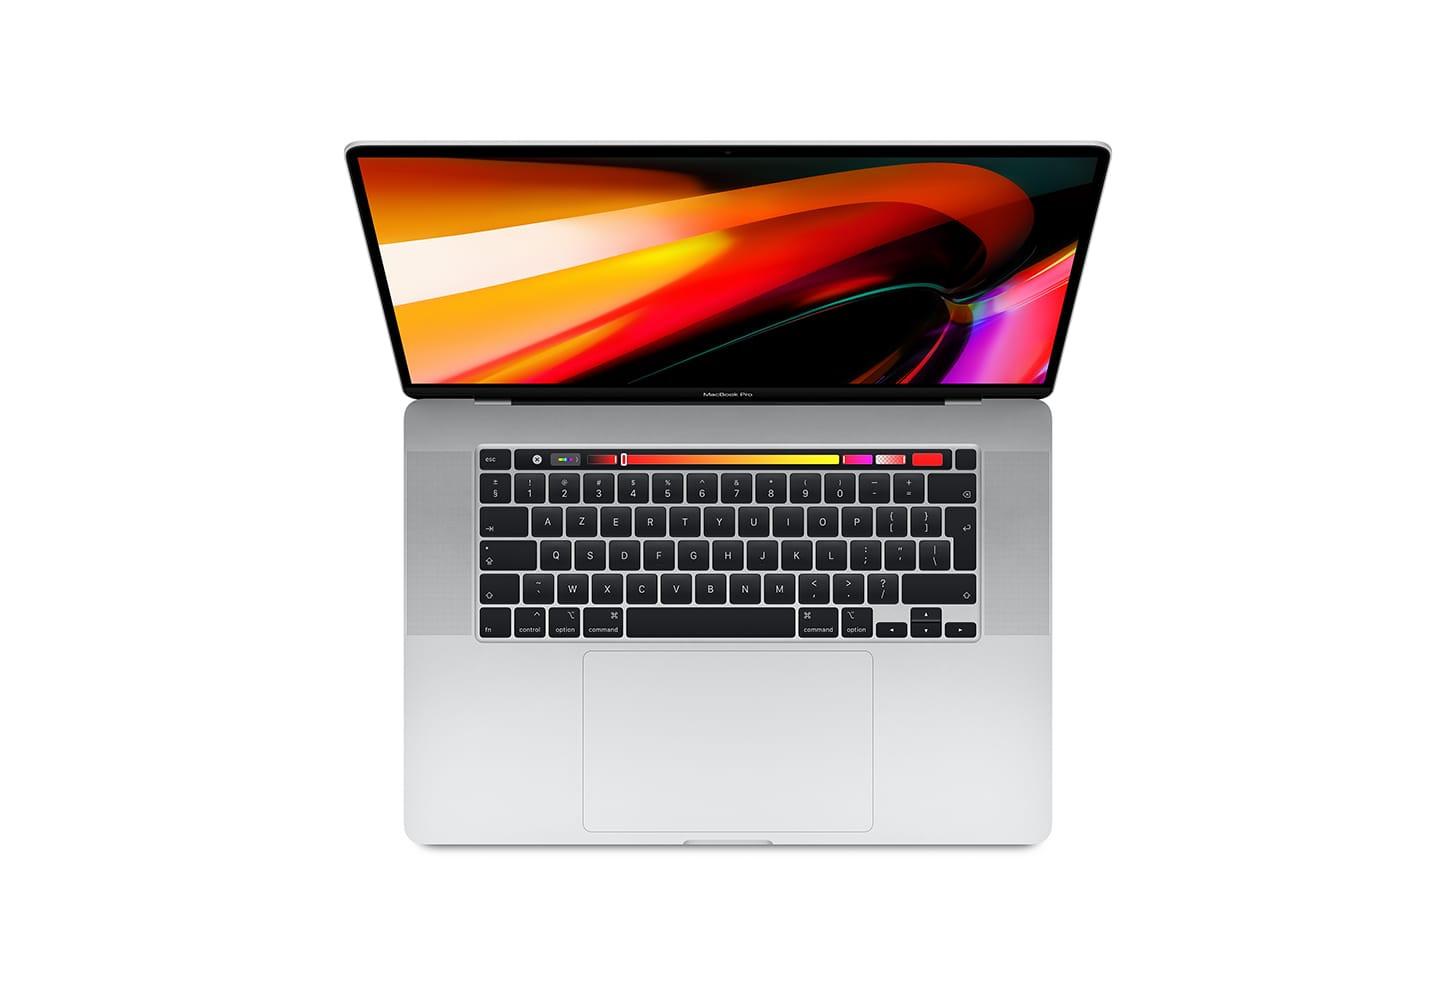 macbookpro-16-silver-2.jpg